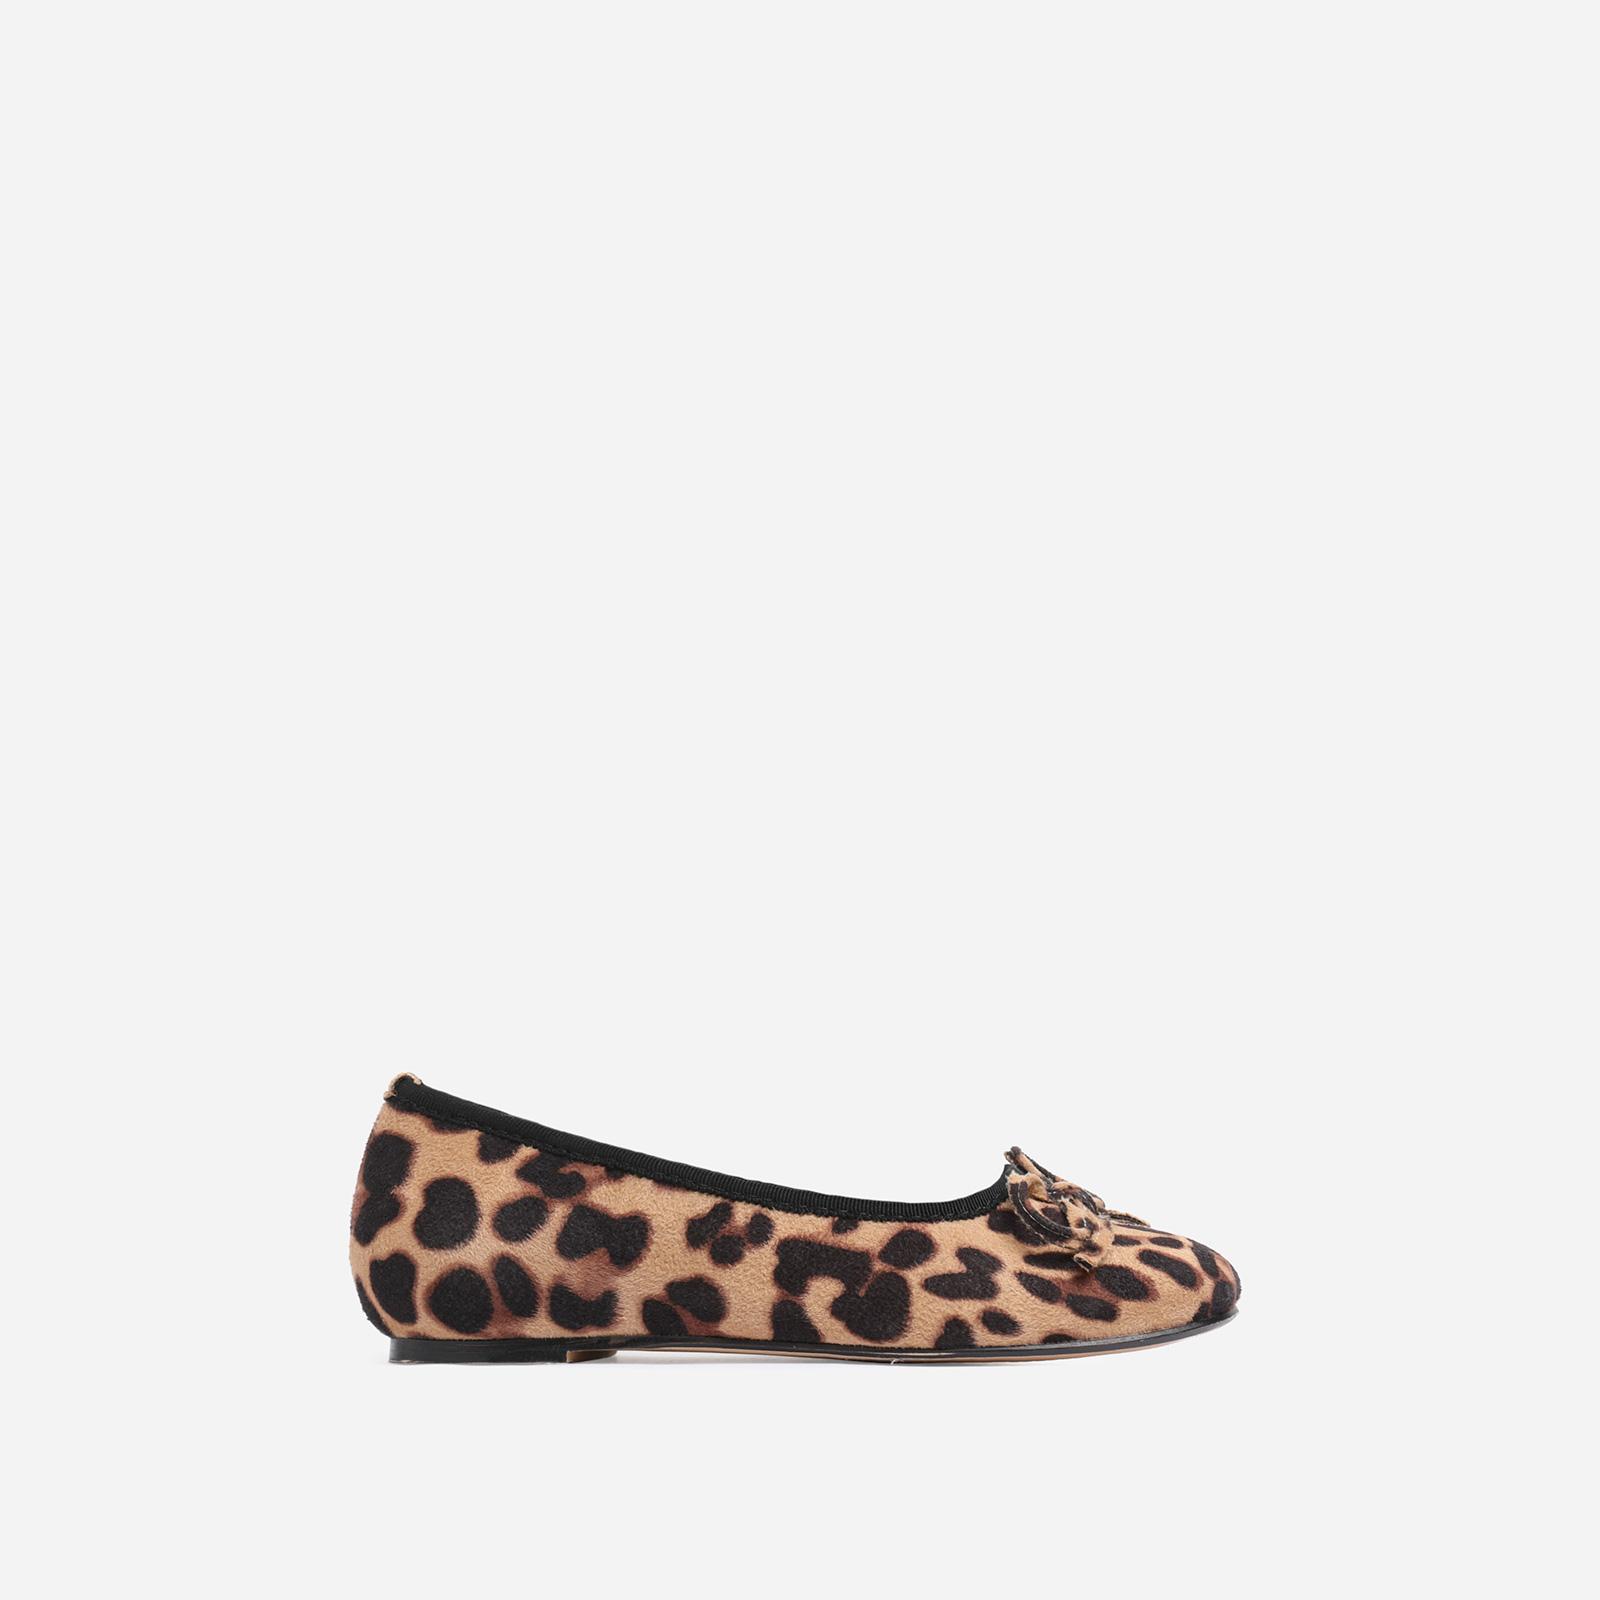 Ballerina Girl's Bow Detail Flat Ballet Pump In Tan Leopard Print Faux Suede